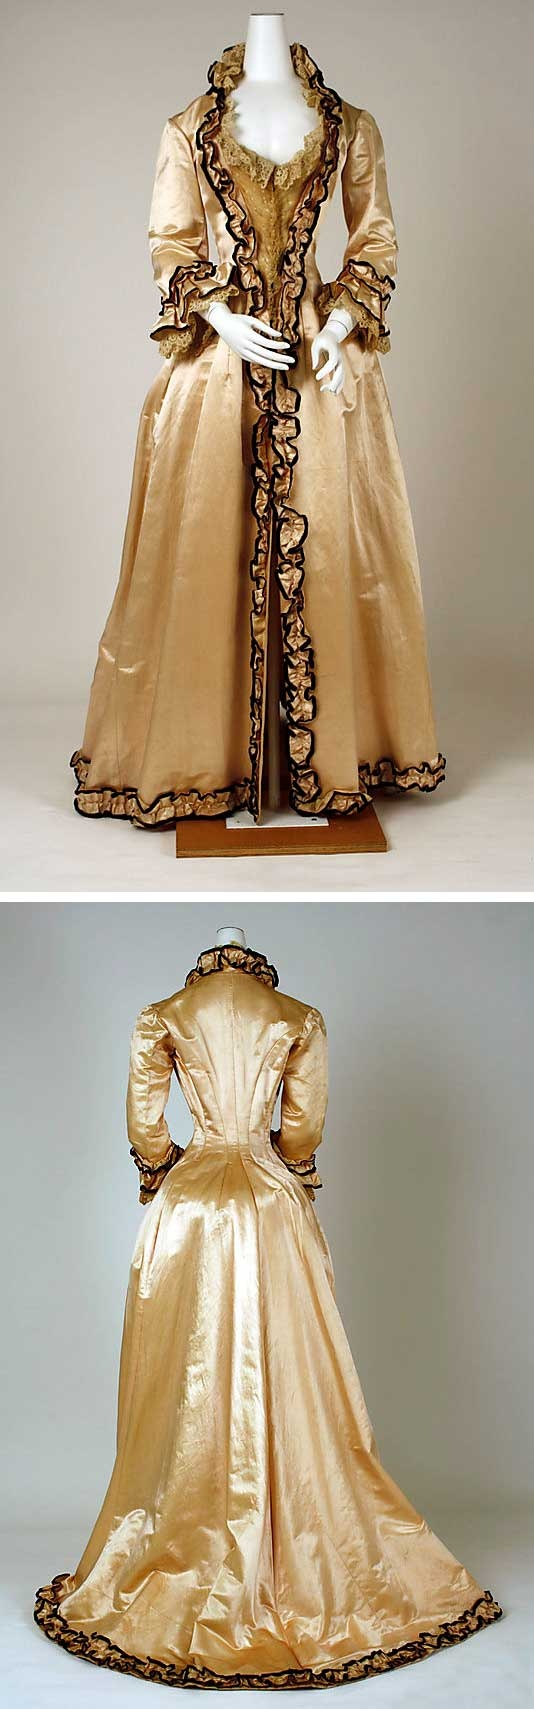 Tea gown, American, ca. 1880. Silk. Metropolitan Museum of Art